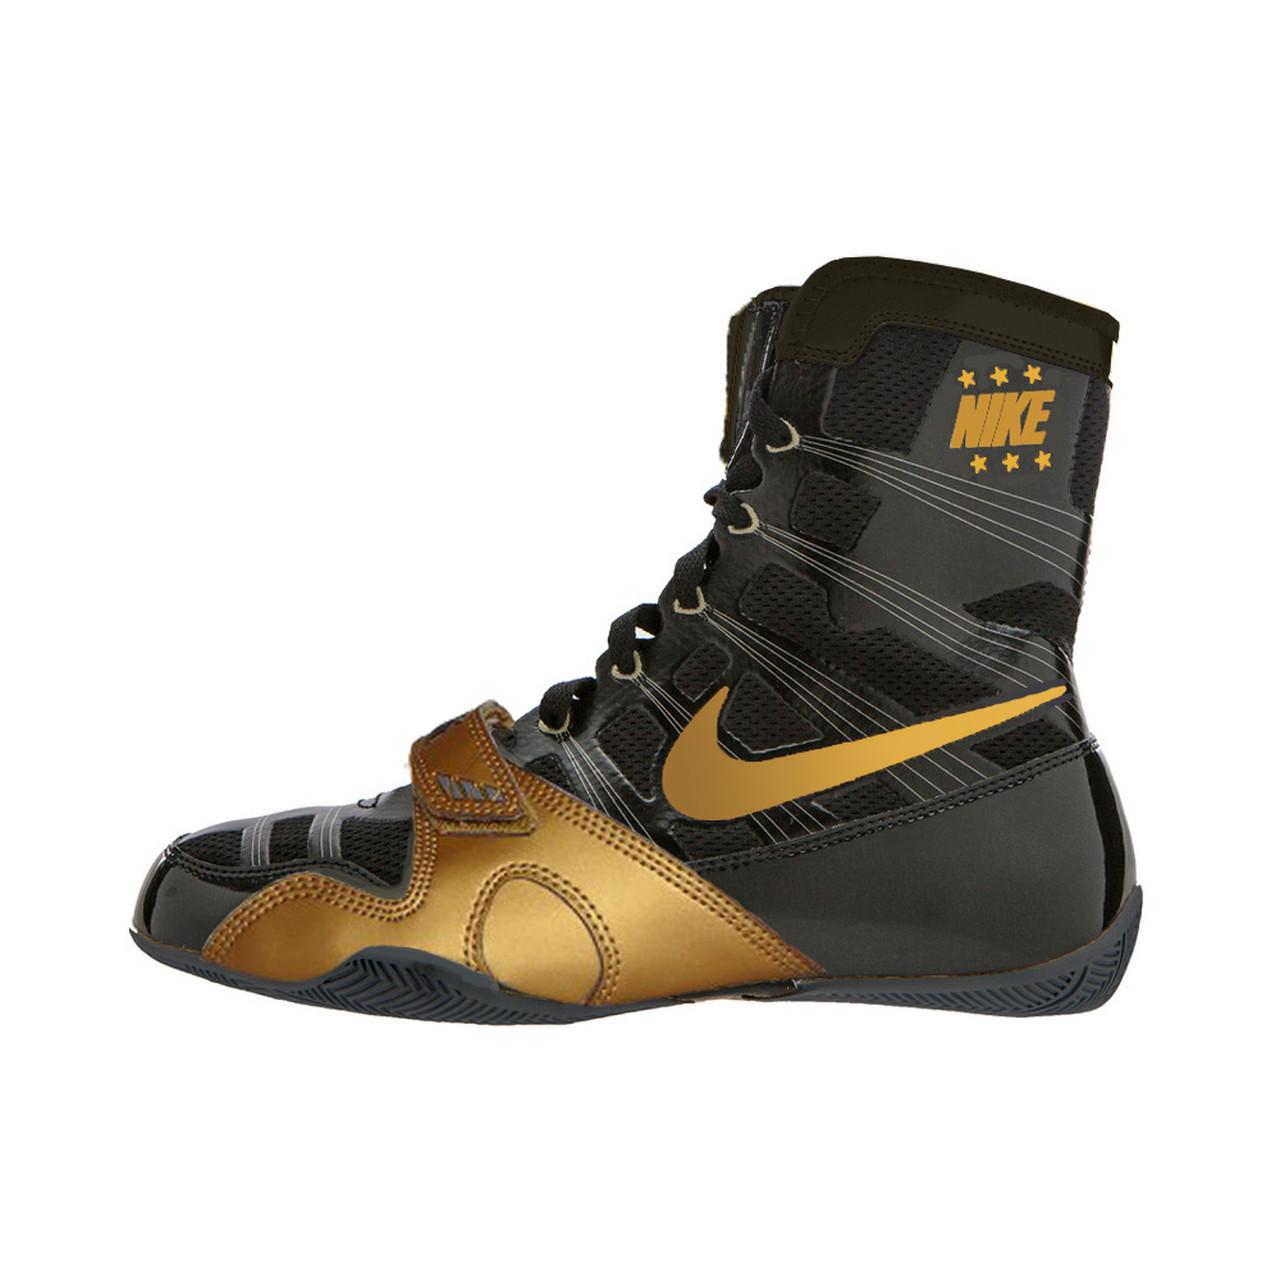 Black/Metallic Gold Boxing Shoes